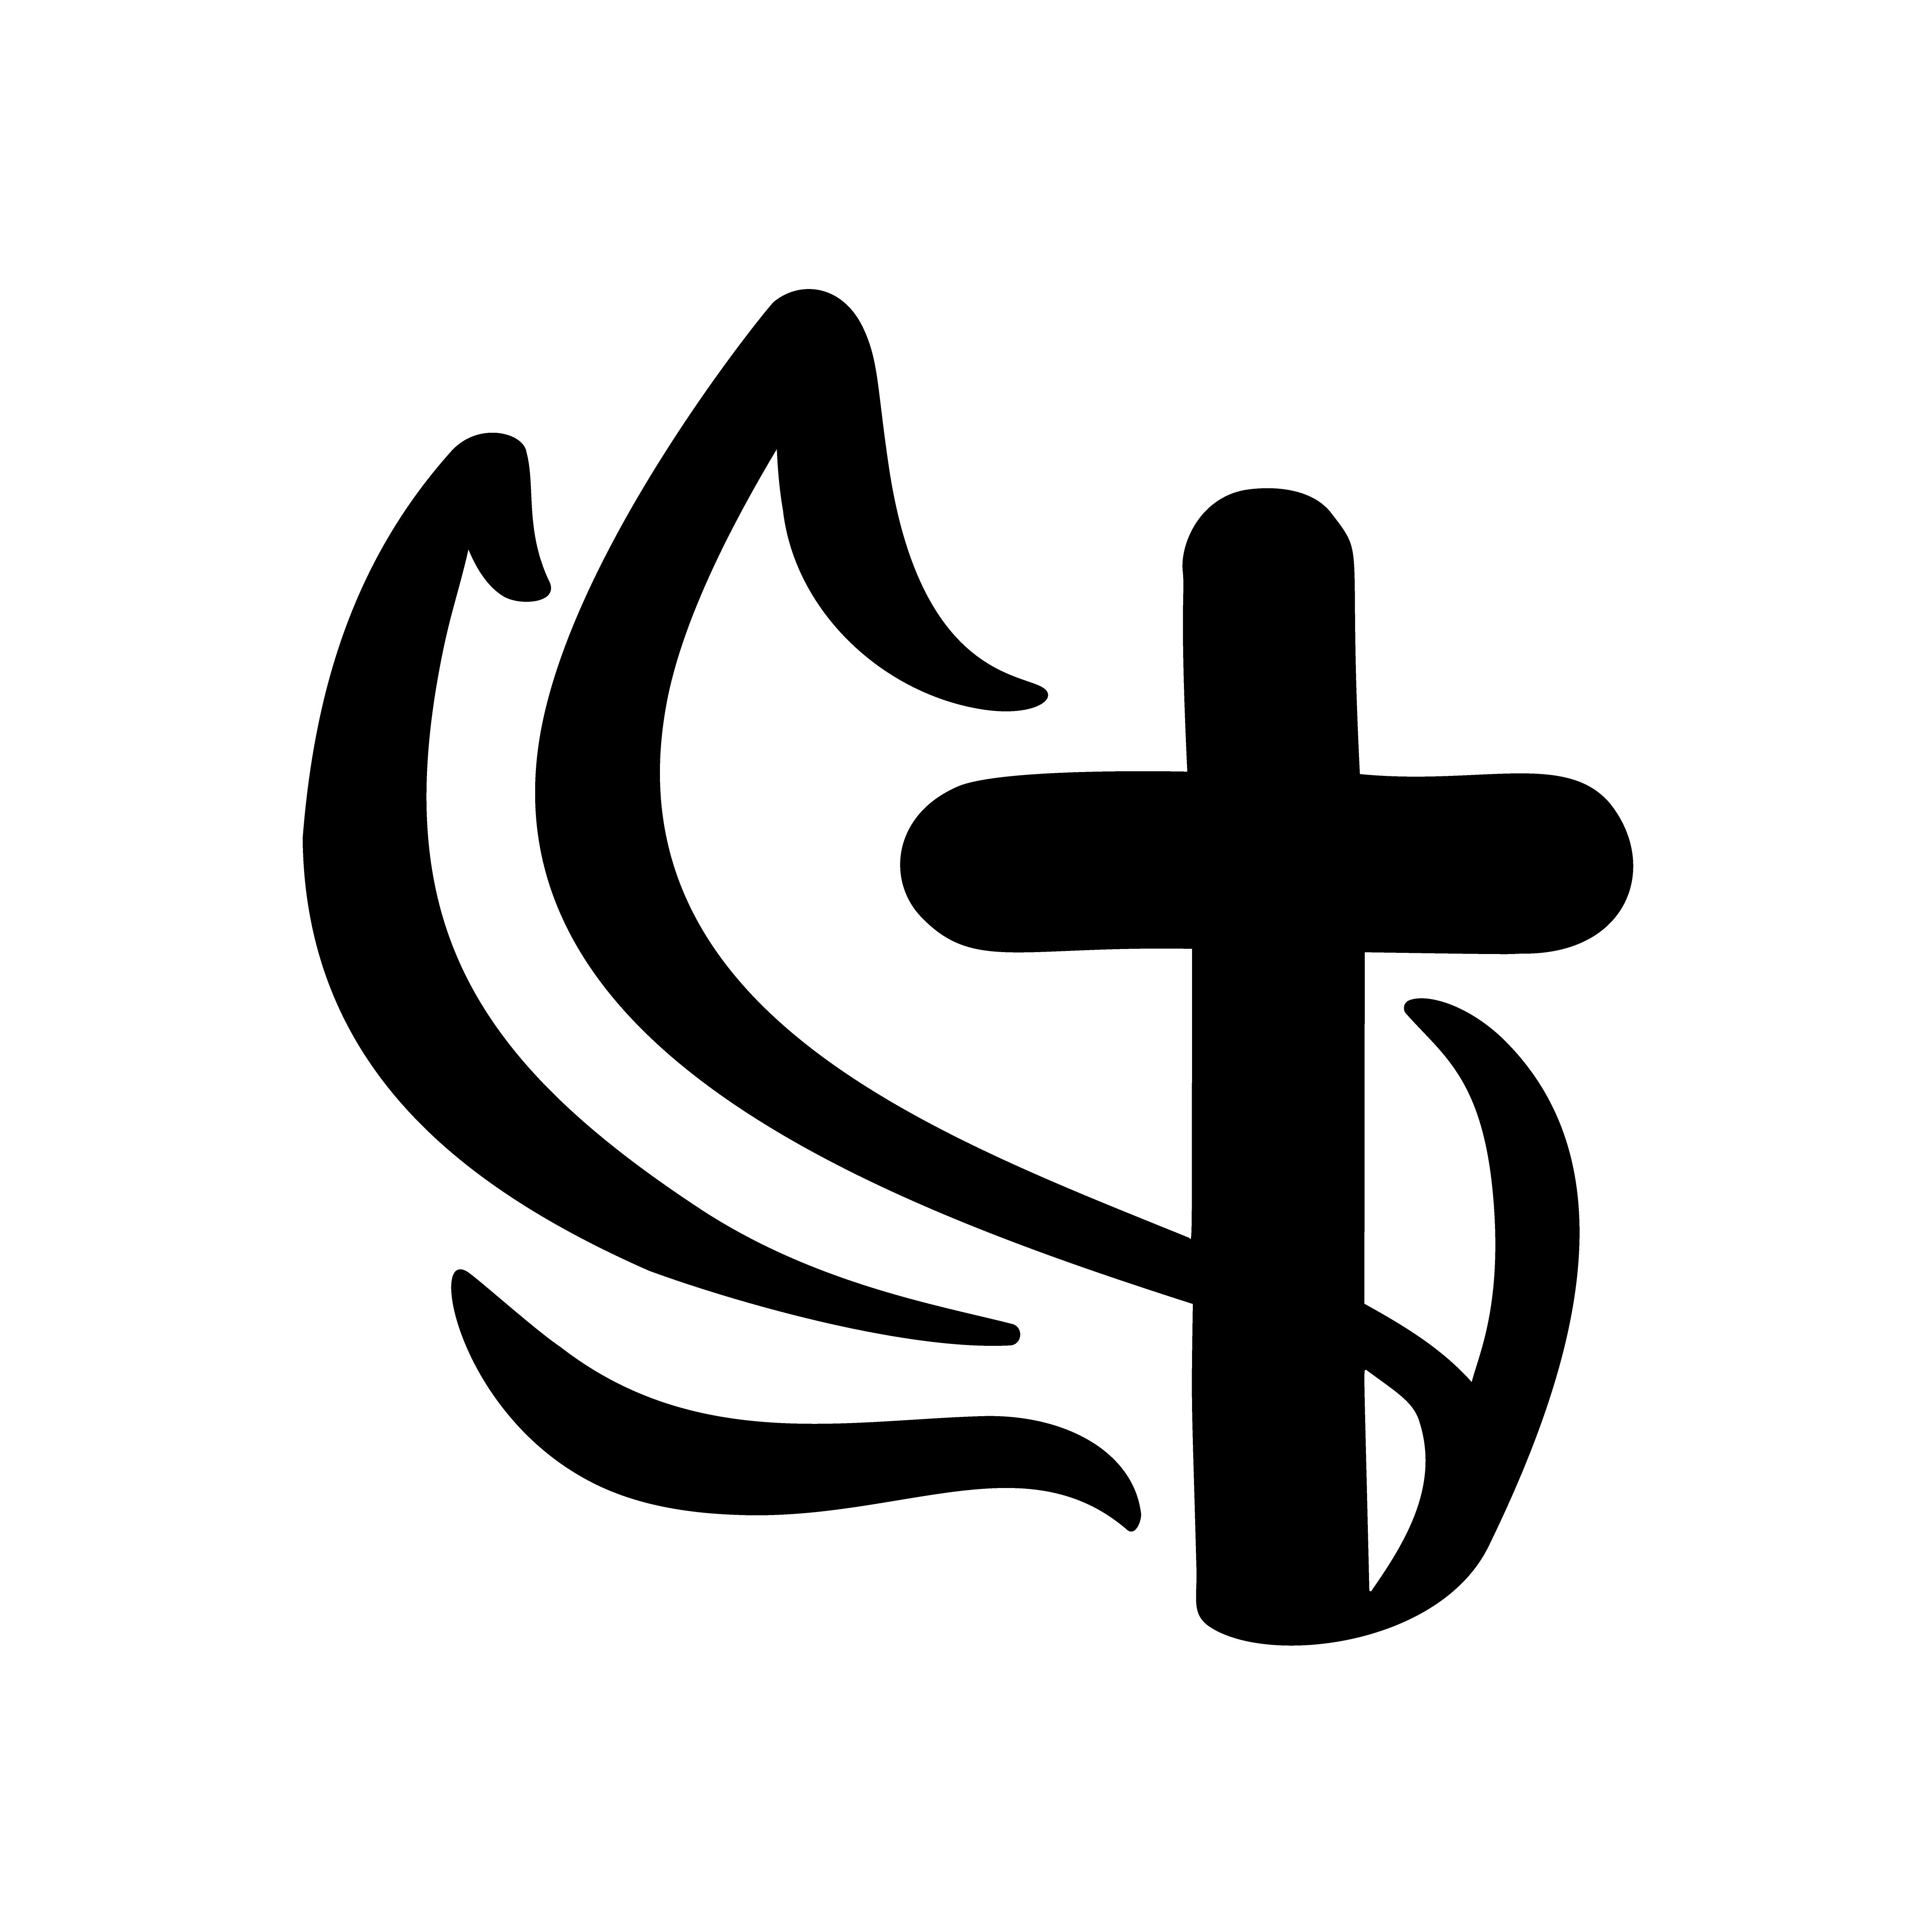 vector illustration of christian logo  emblem with concept